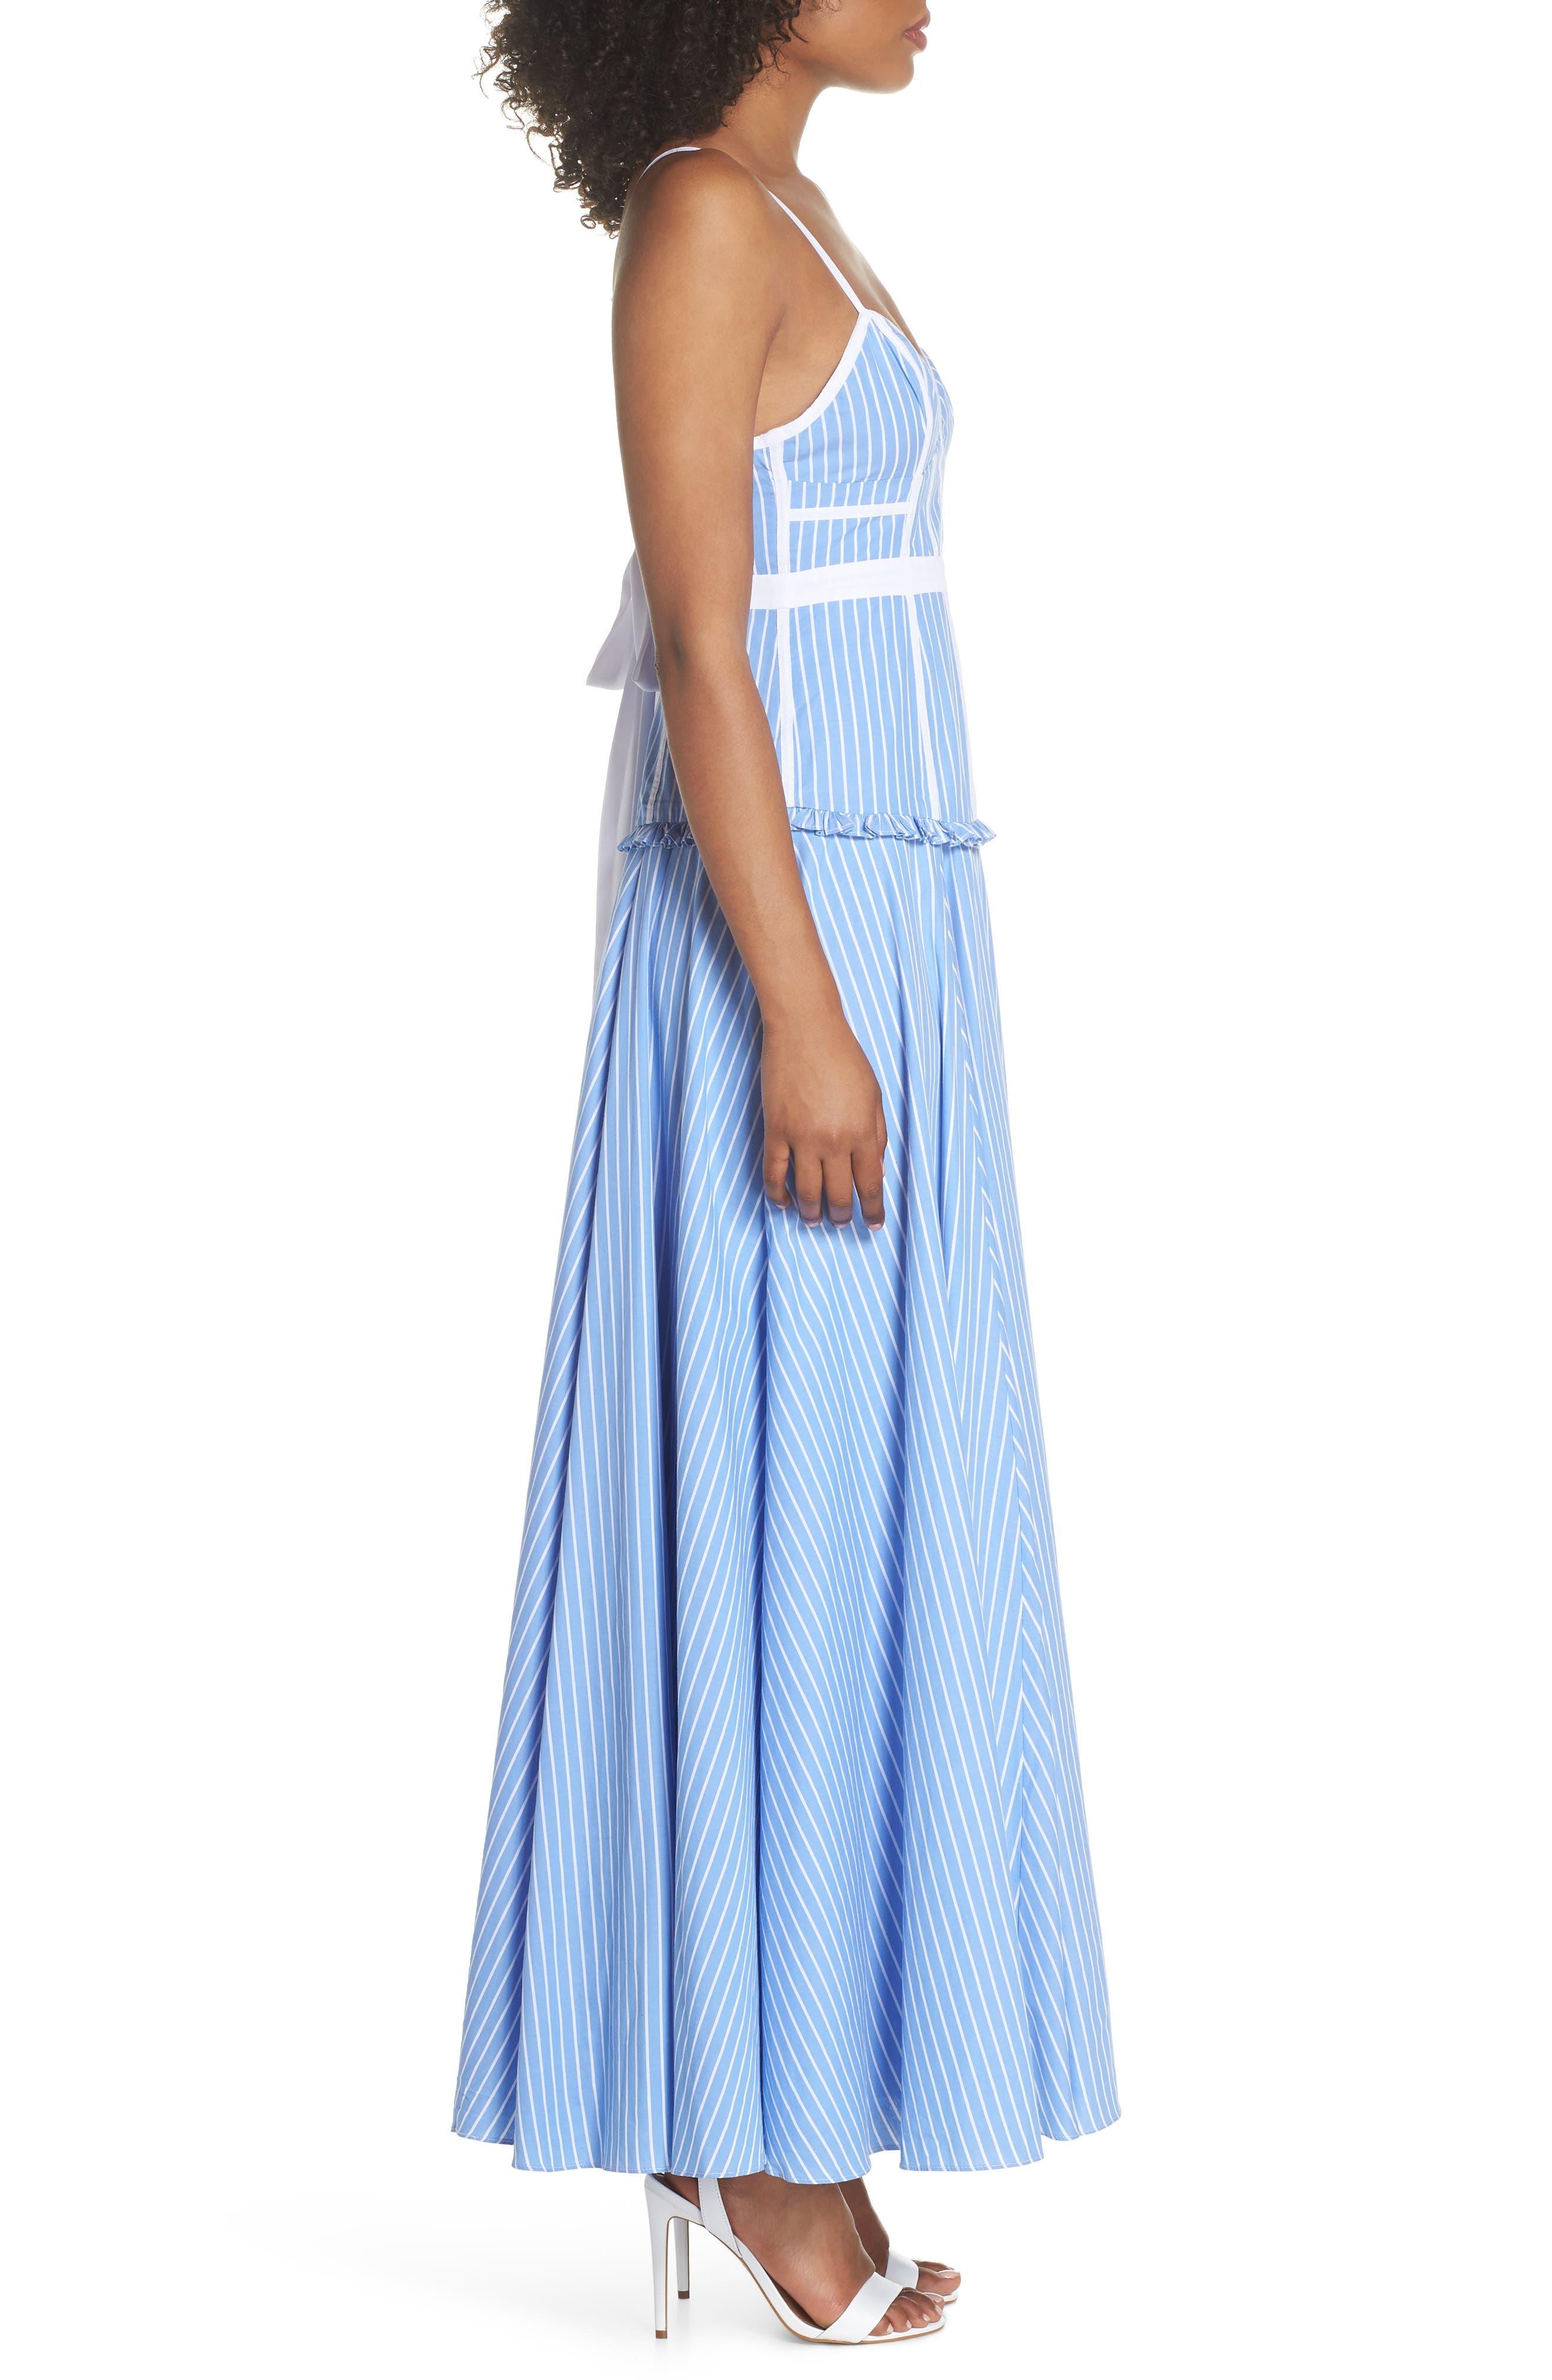 Morrow Stripe Corset Gown,                             Alternate thumbnail 3, color,                             Pale Blue/ White Stripe